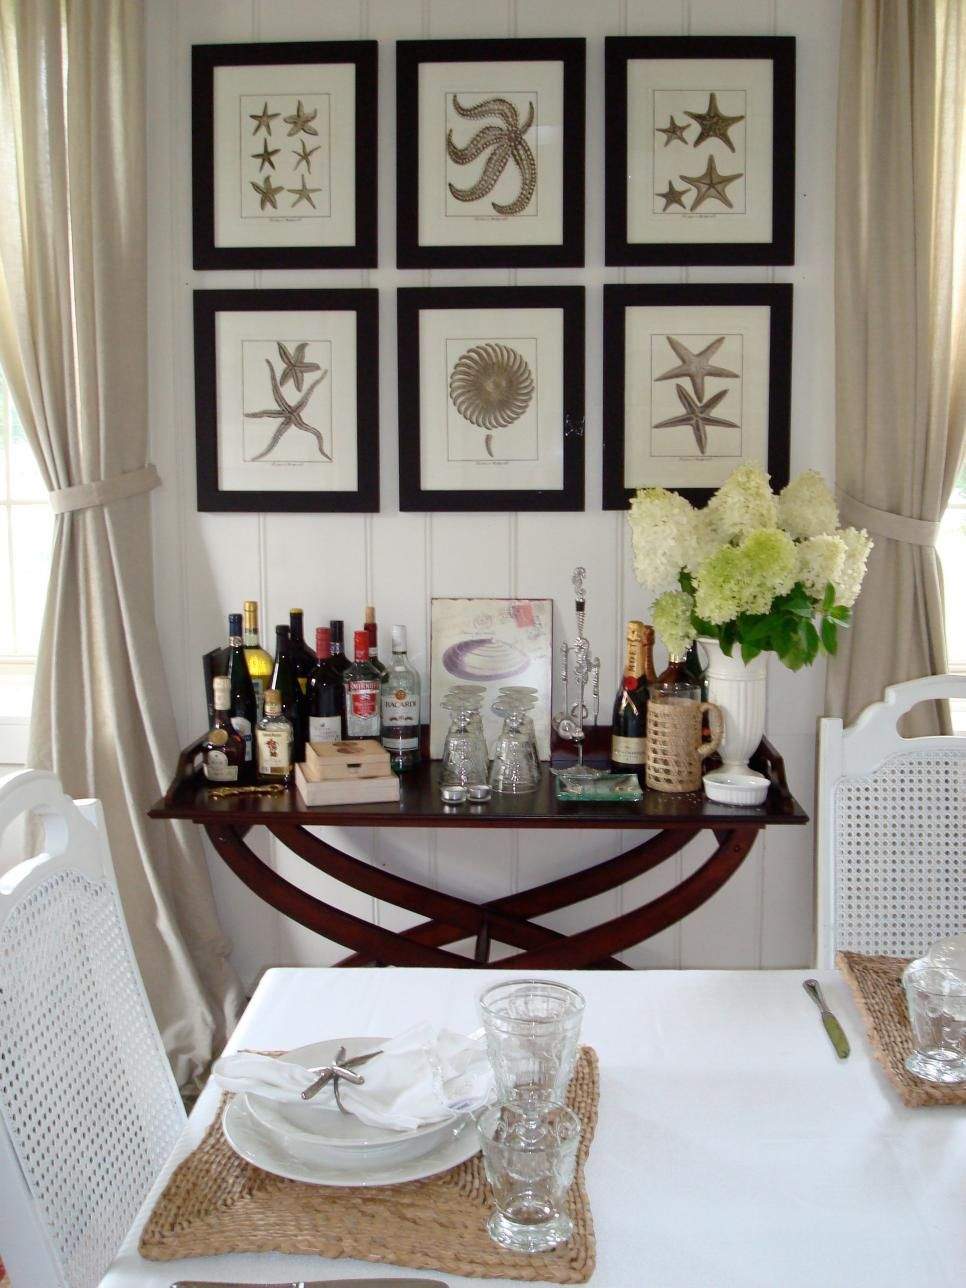 Coastal Decorating Ideas Decor Interior Design Hgtv And Decorating - Beach themed dining room ideas